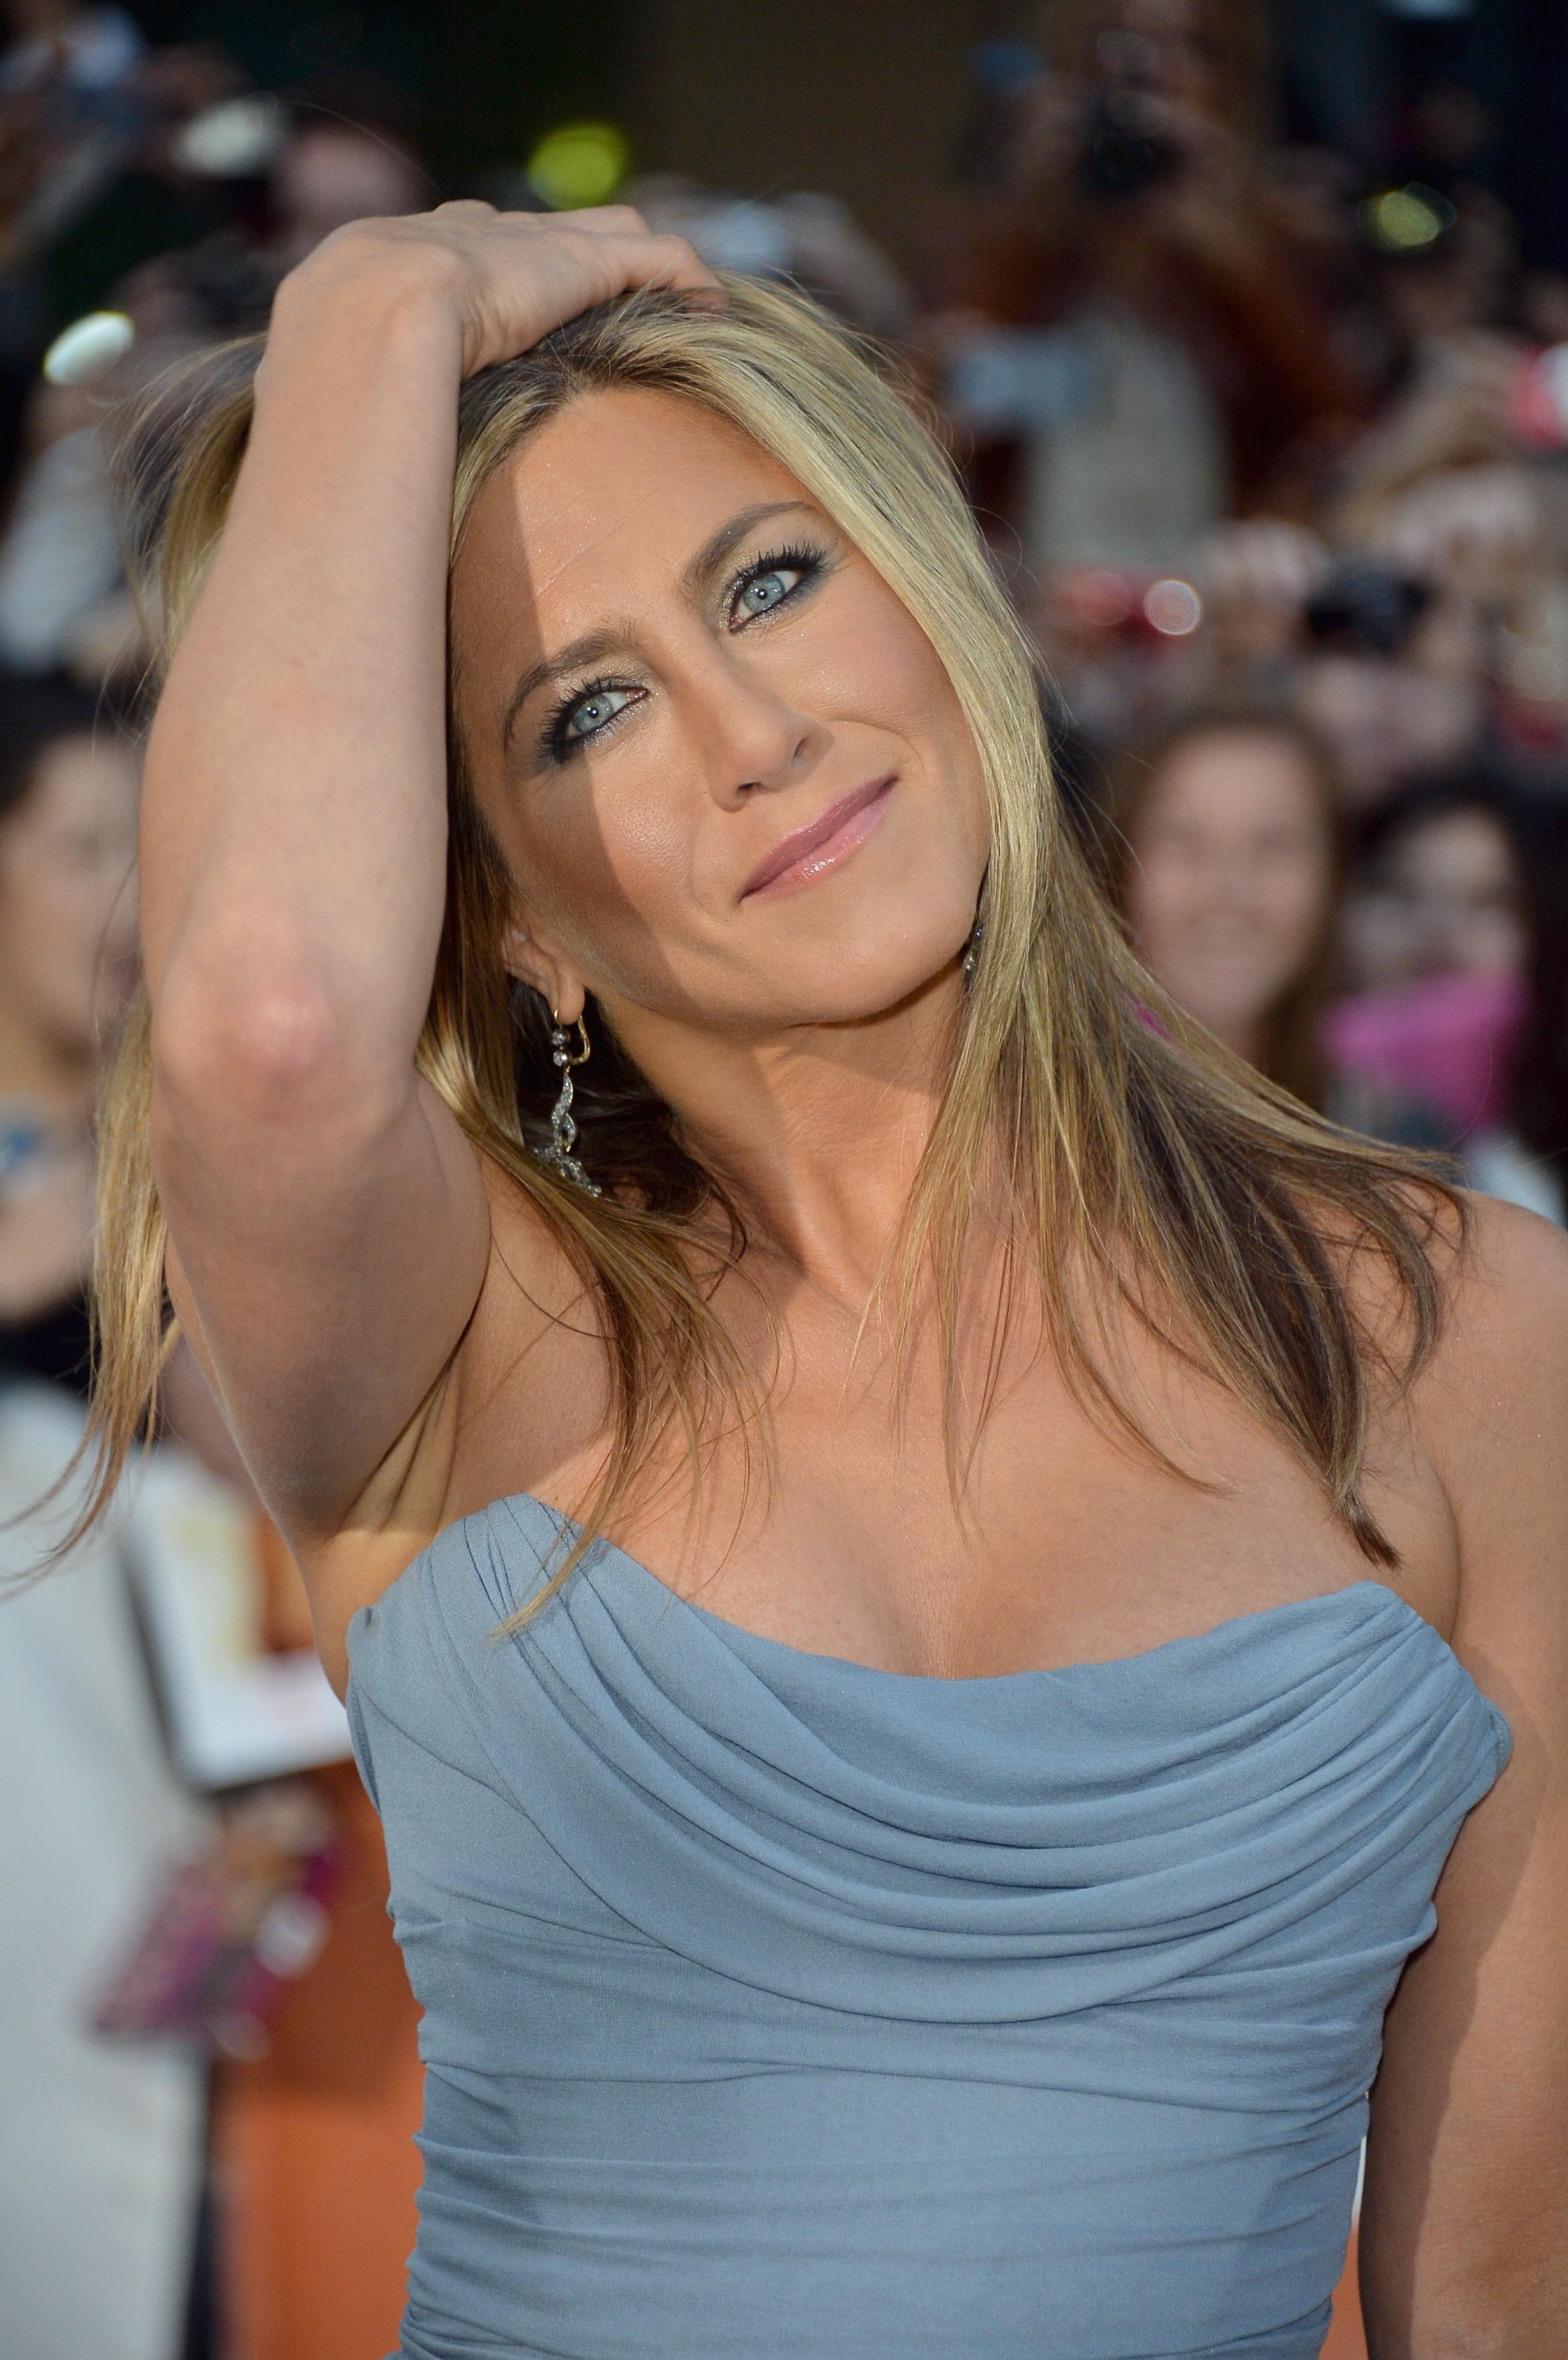 Jennifer Aniston - Nude Celebrities - Recent Celebrity Updates